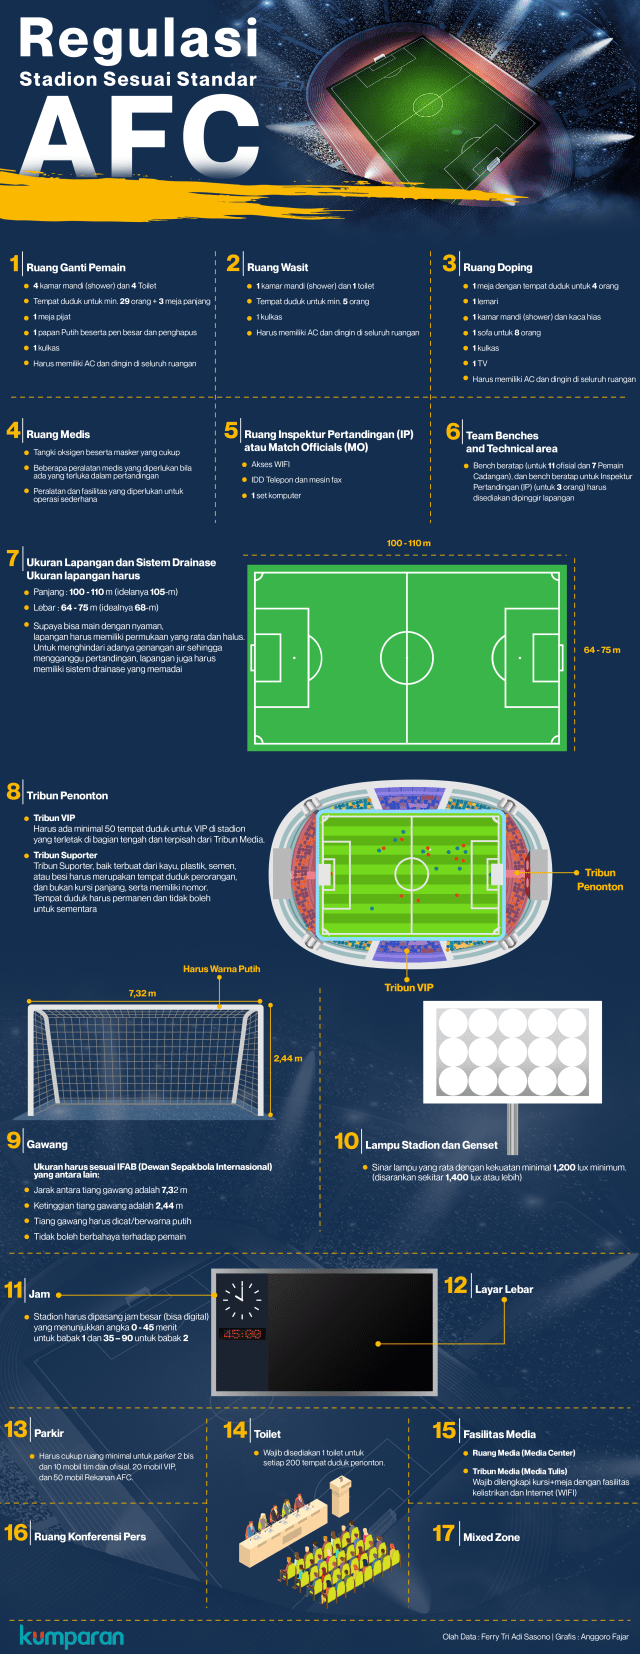 6 Stadion Piala Dunia U-20 Ditetapkan, Tersebar di 3 Pulau (23701)